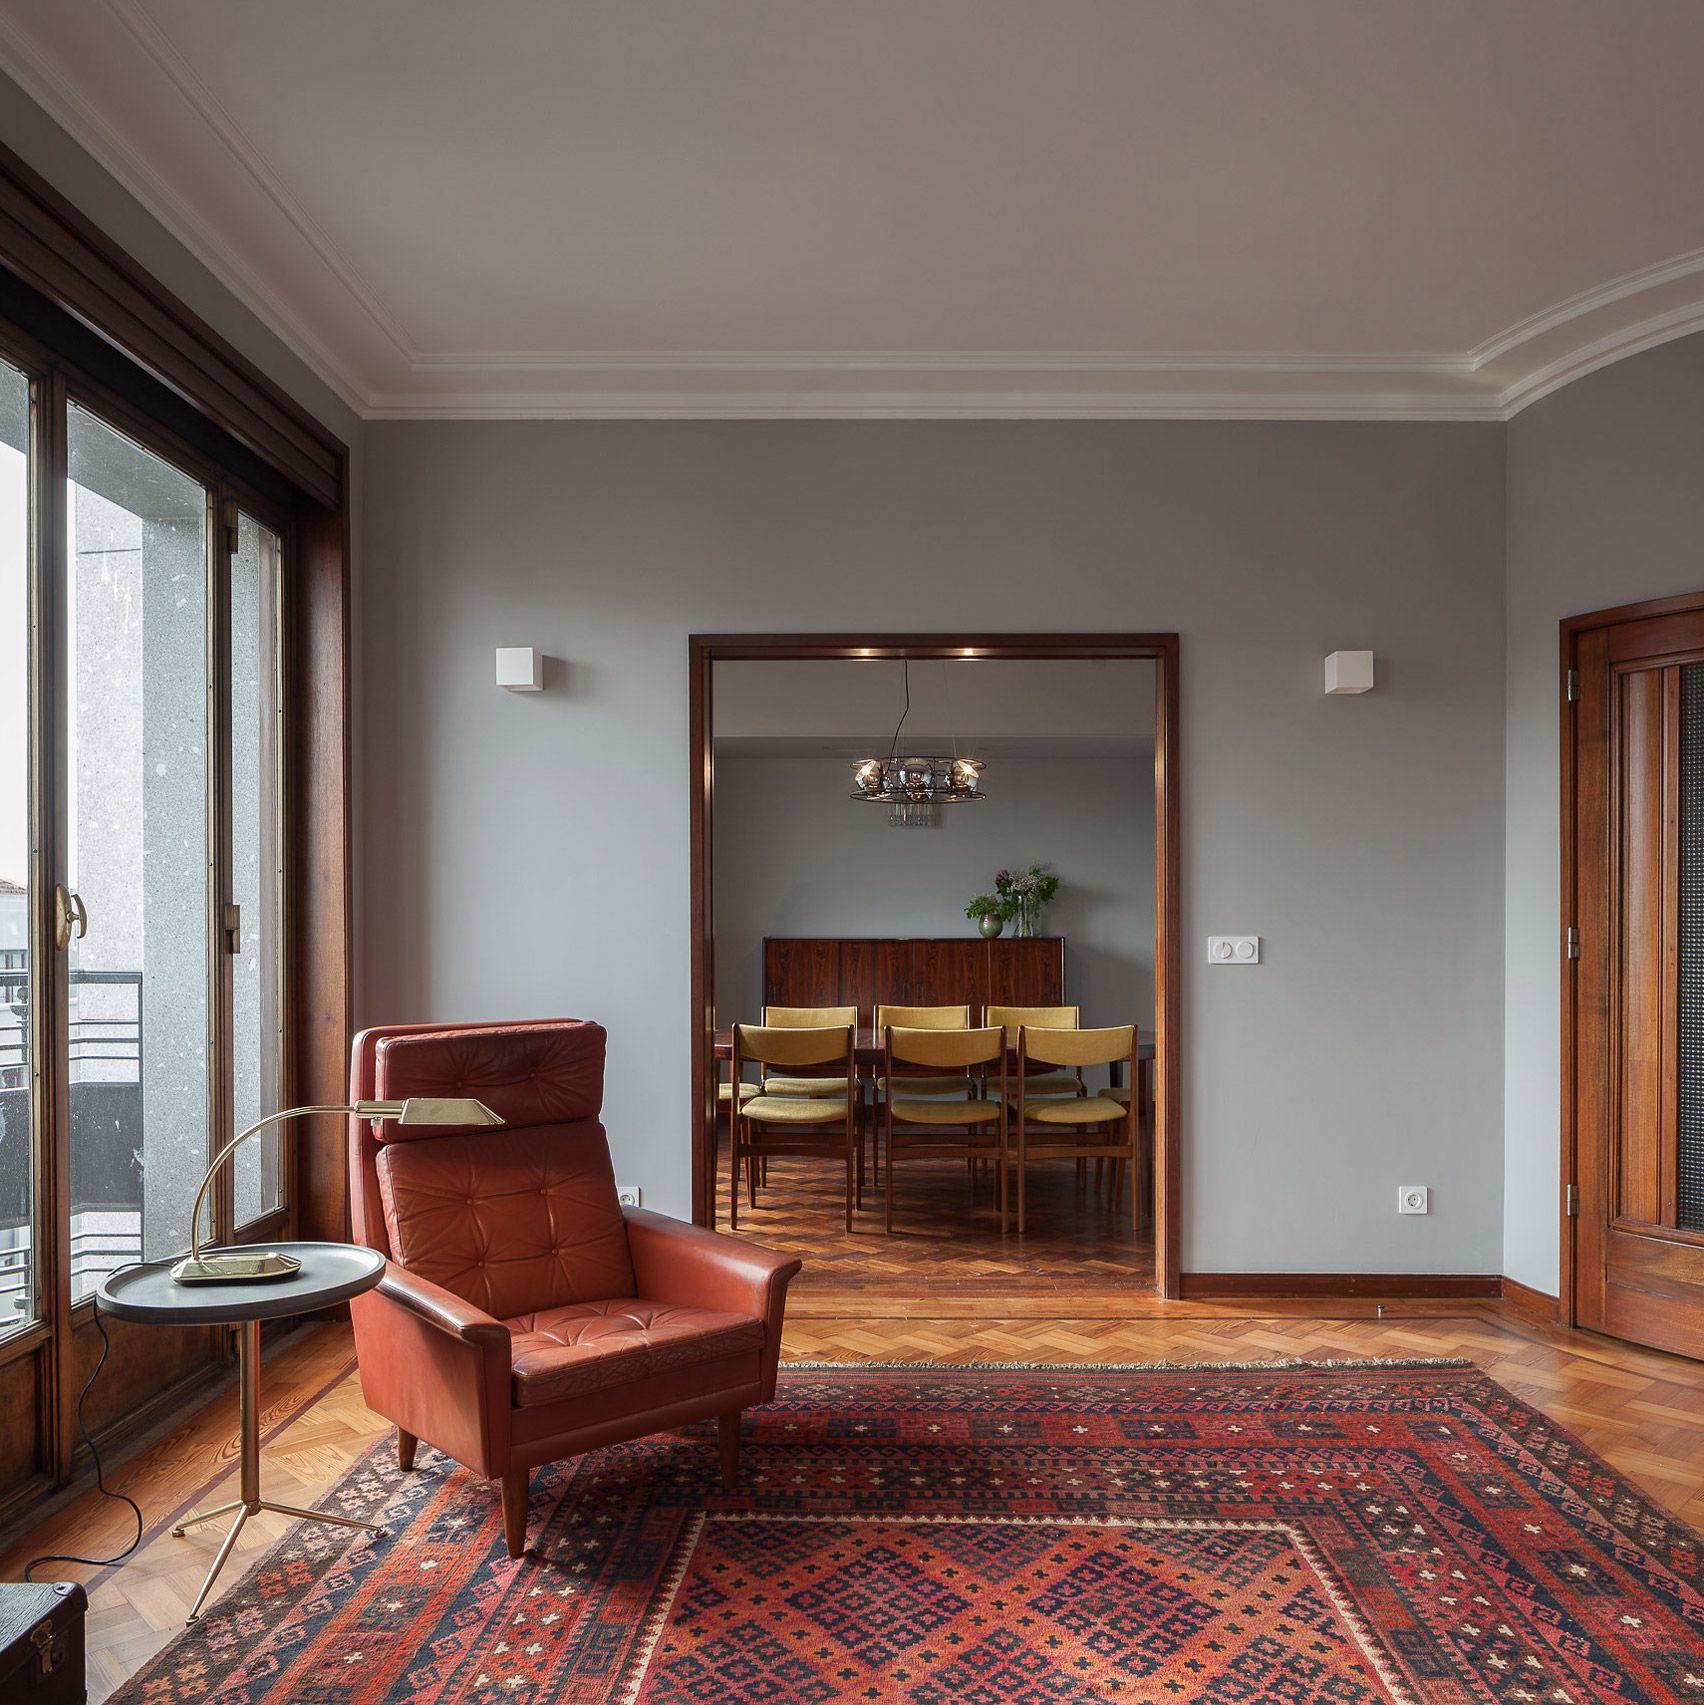 Vintage Home Decore: 3 Dazzling Apartments With Retro Interiors In 1940s Porto